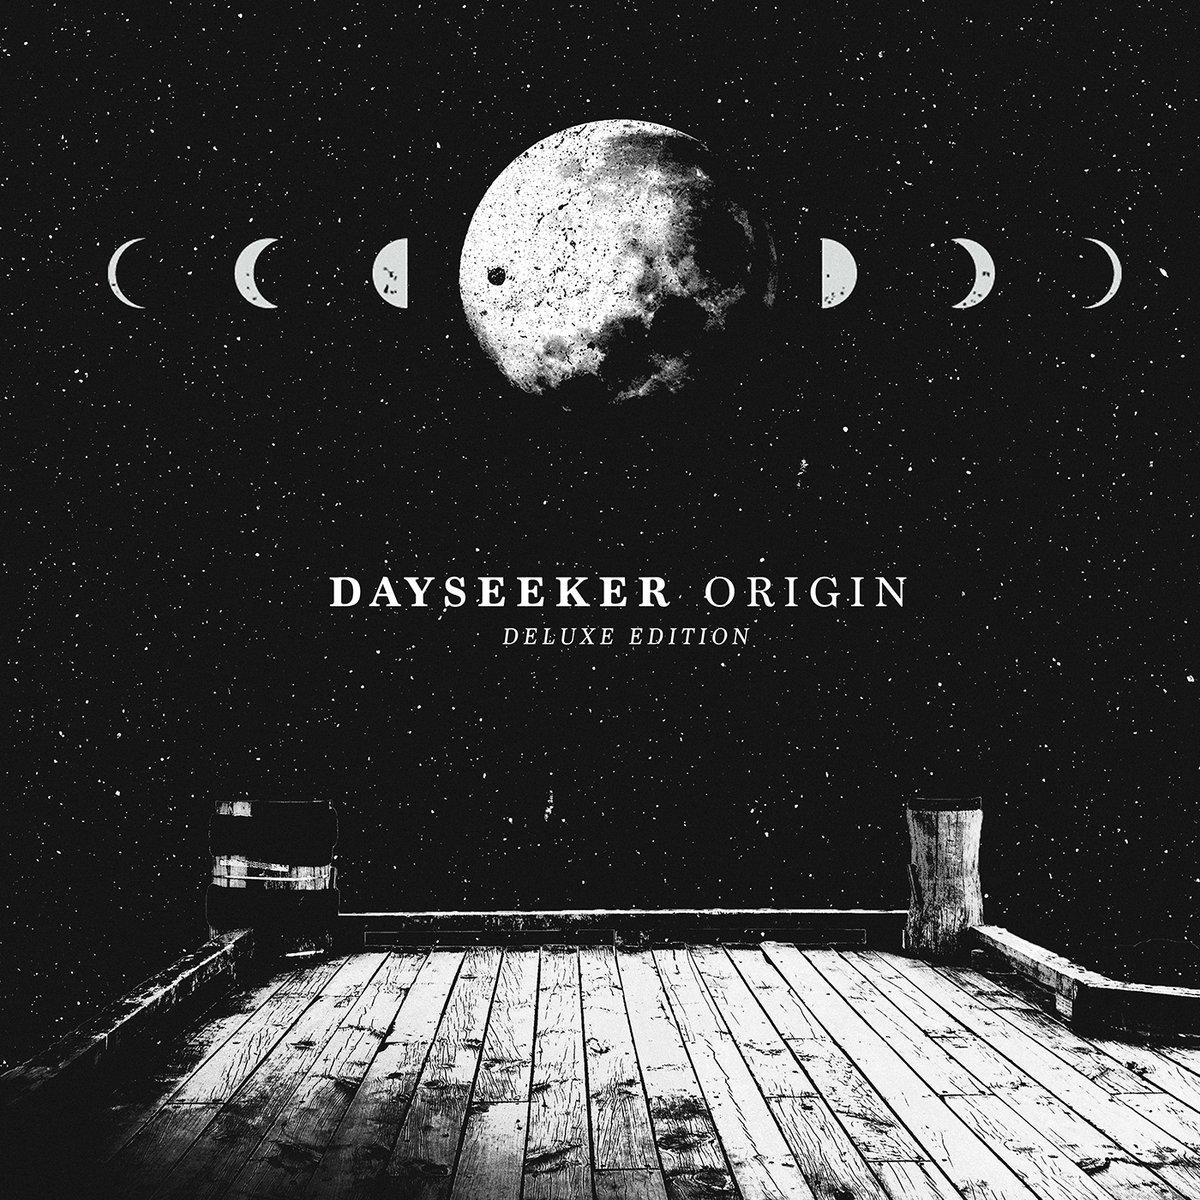 Dayseeker - The Burning of Bridges (Reimagined) (2016)